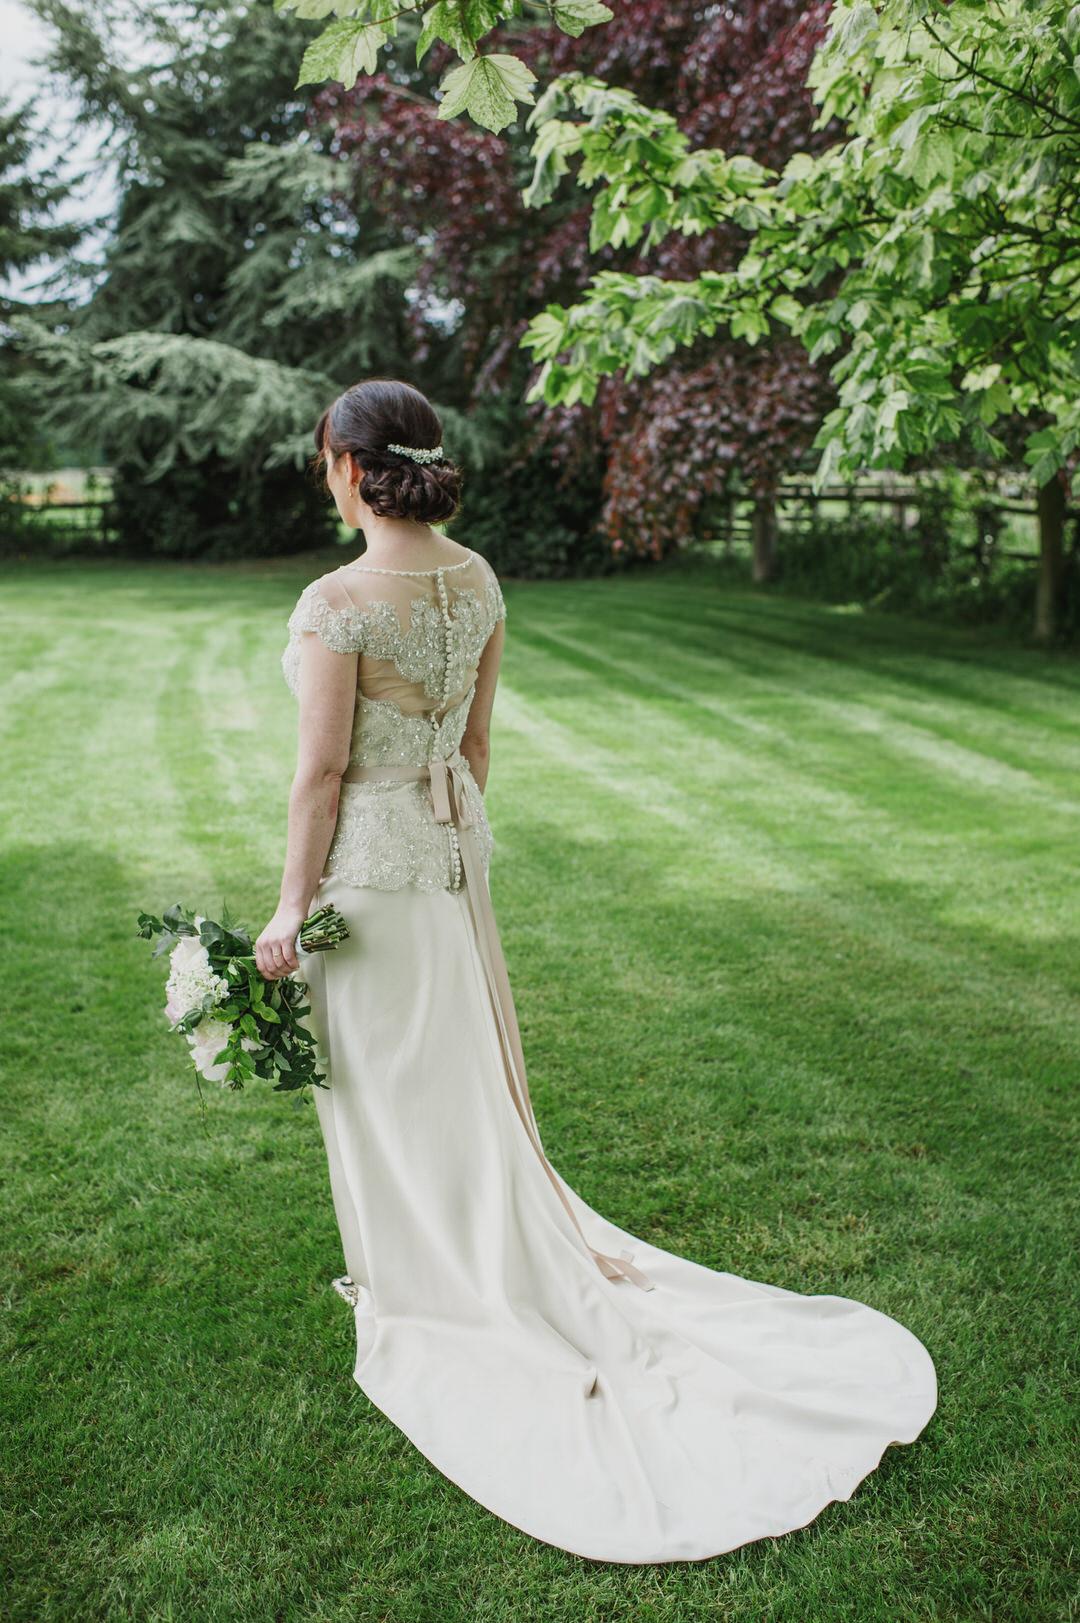 Karen-Flower-Herons-Farm-wedding-1092